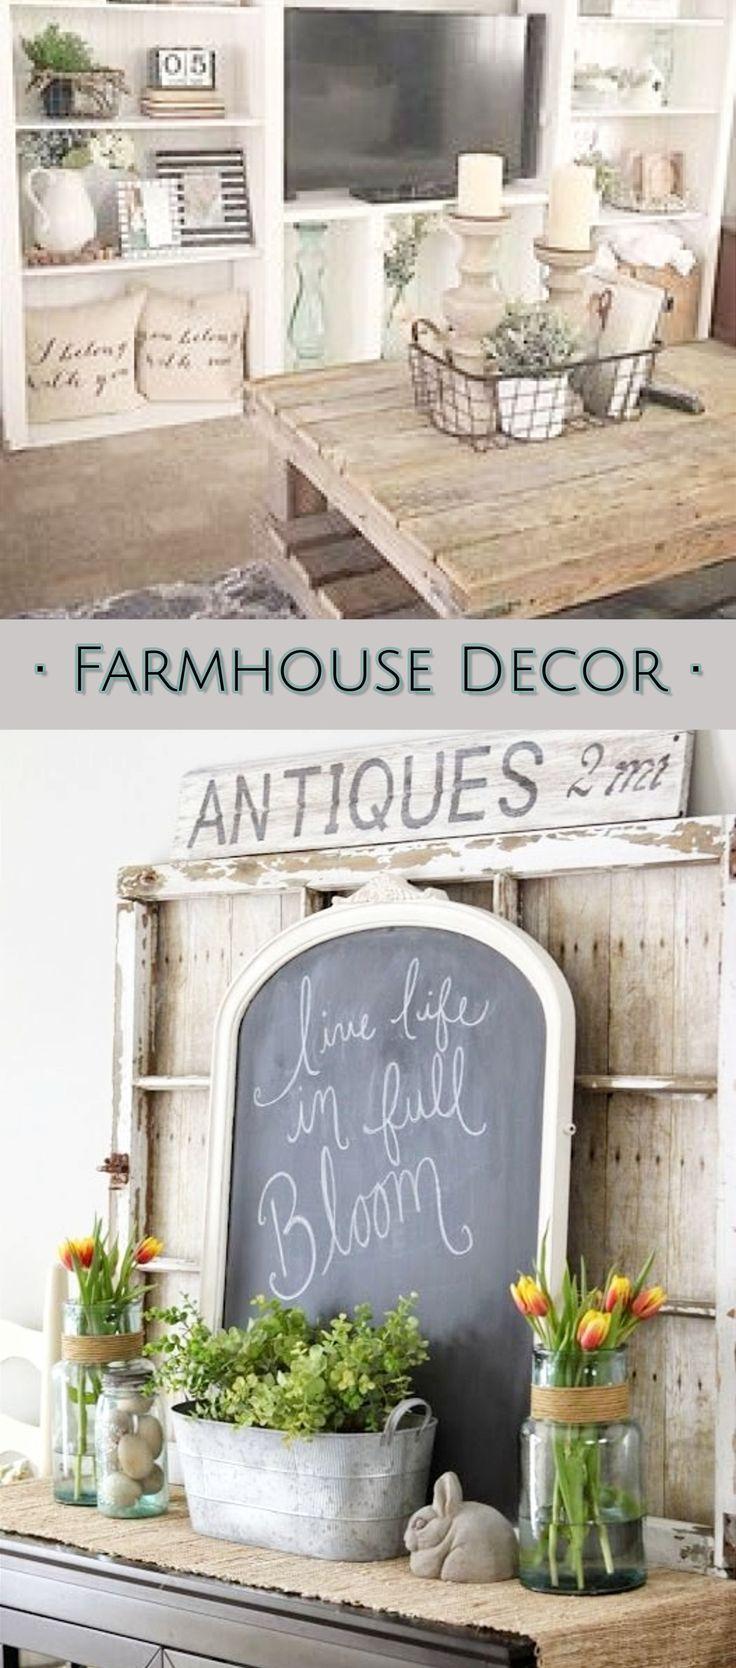 Farmhouse Home Decor Ideas: Best 25+ Chalkboard Decor Ideas On Pinterest